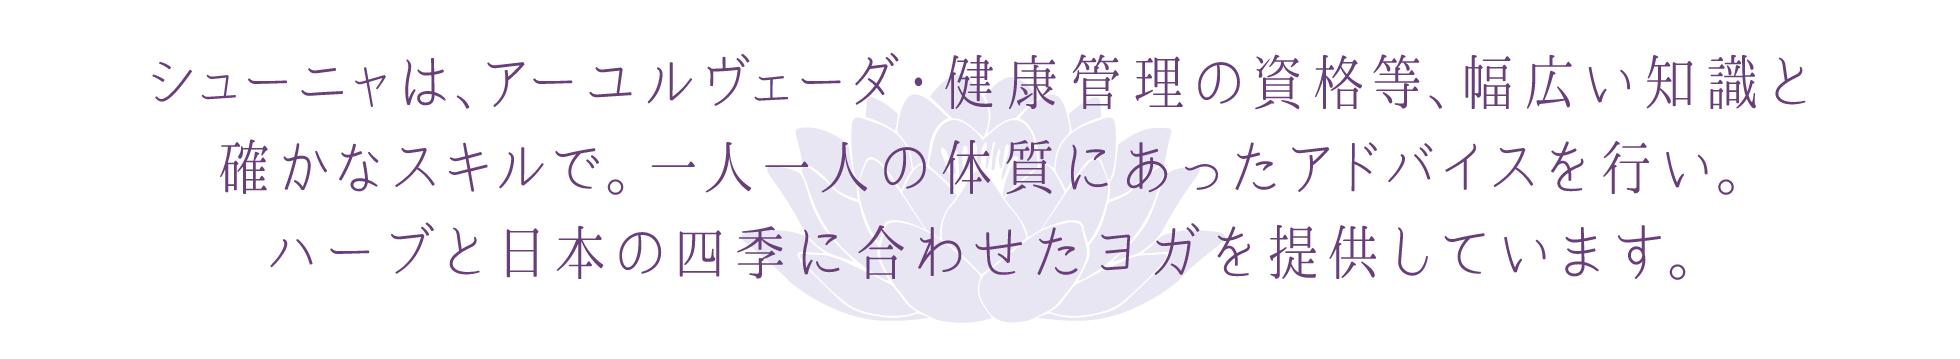 YOGA_TOPページのメッセージ